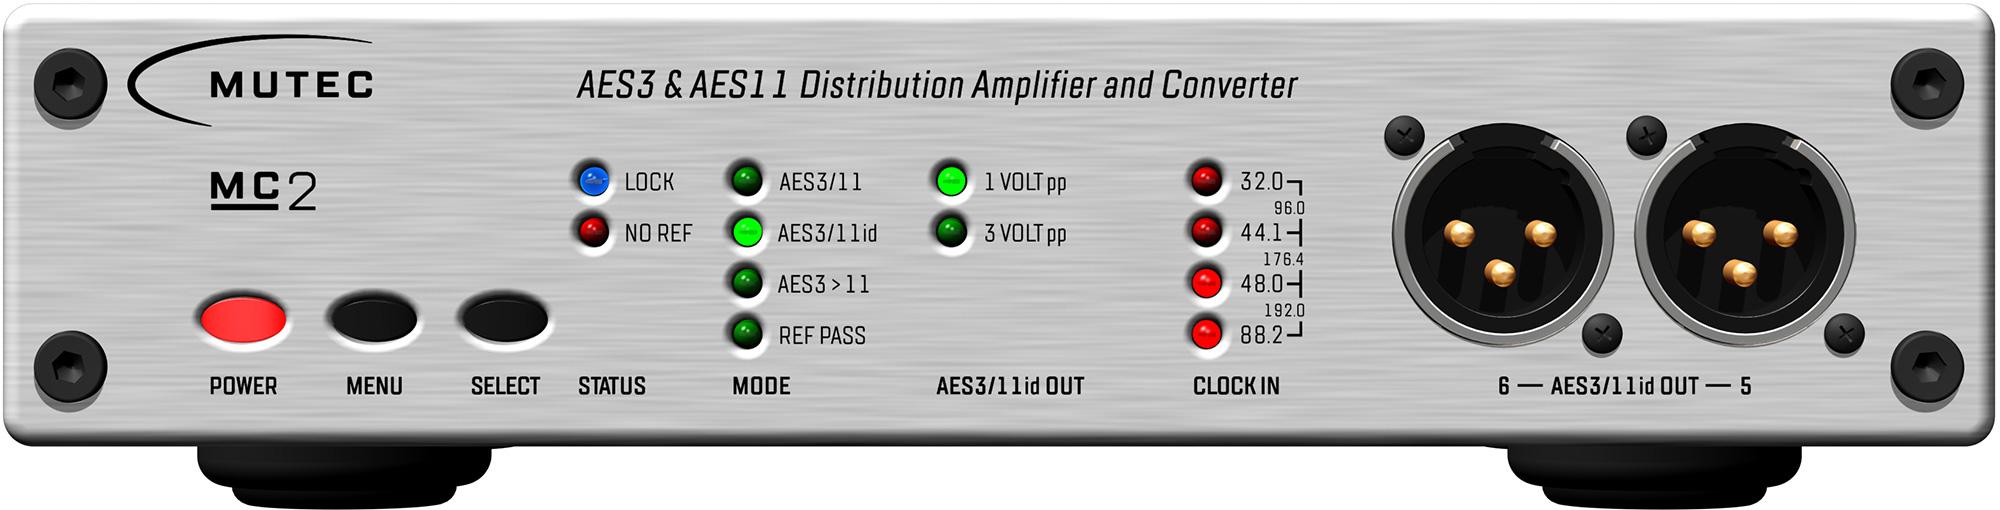 Mutec MC-2 Signal Distributor + Converter for AES formats MUT-MC-2